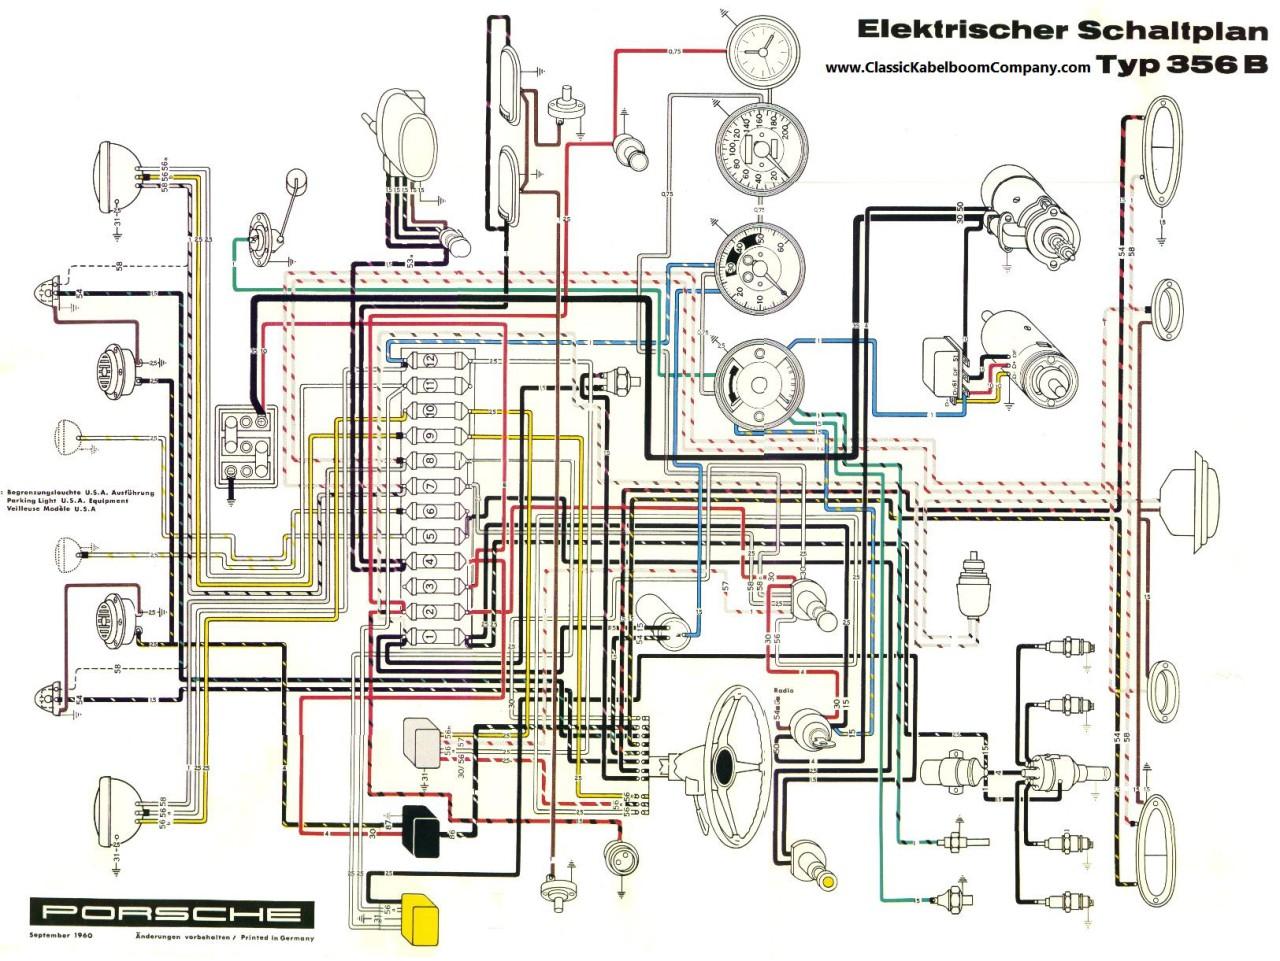 classic kabelboom company bedrading schema s porsche wiring rh classickabelboomcompany com wiring diagram 1967 porsche 912 porsche 912 wiring diagram